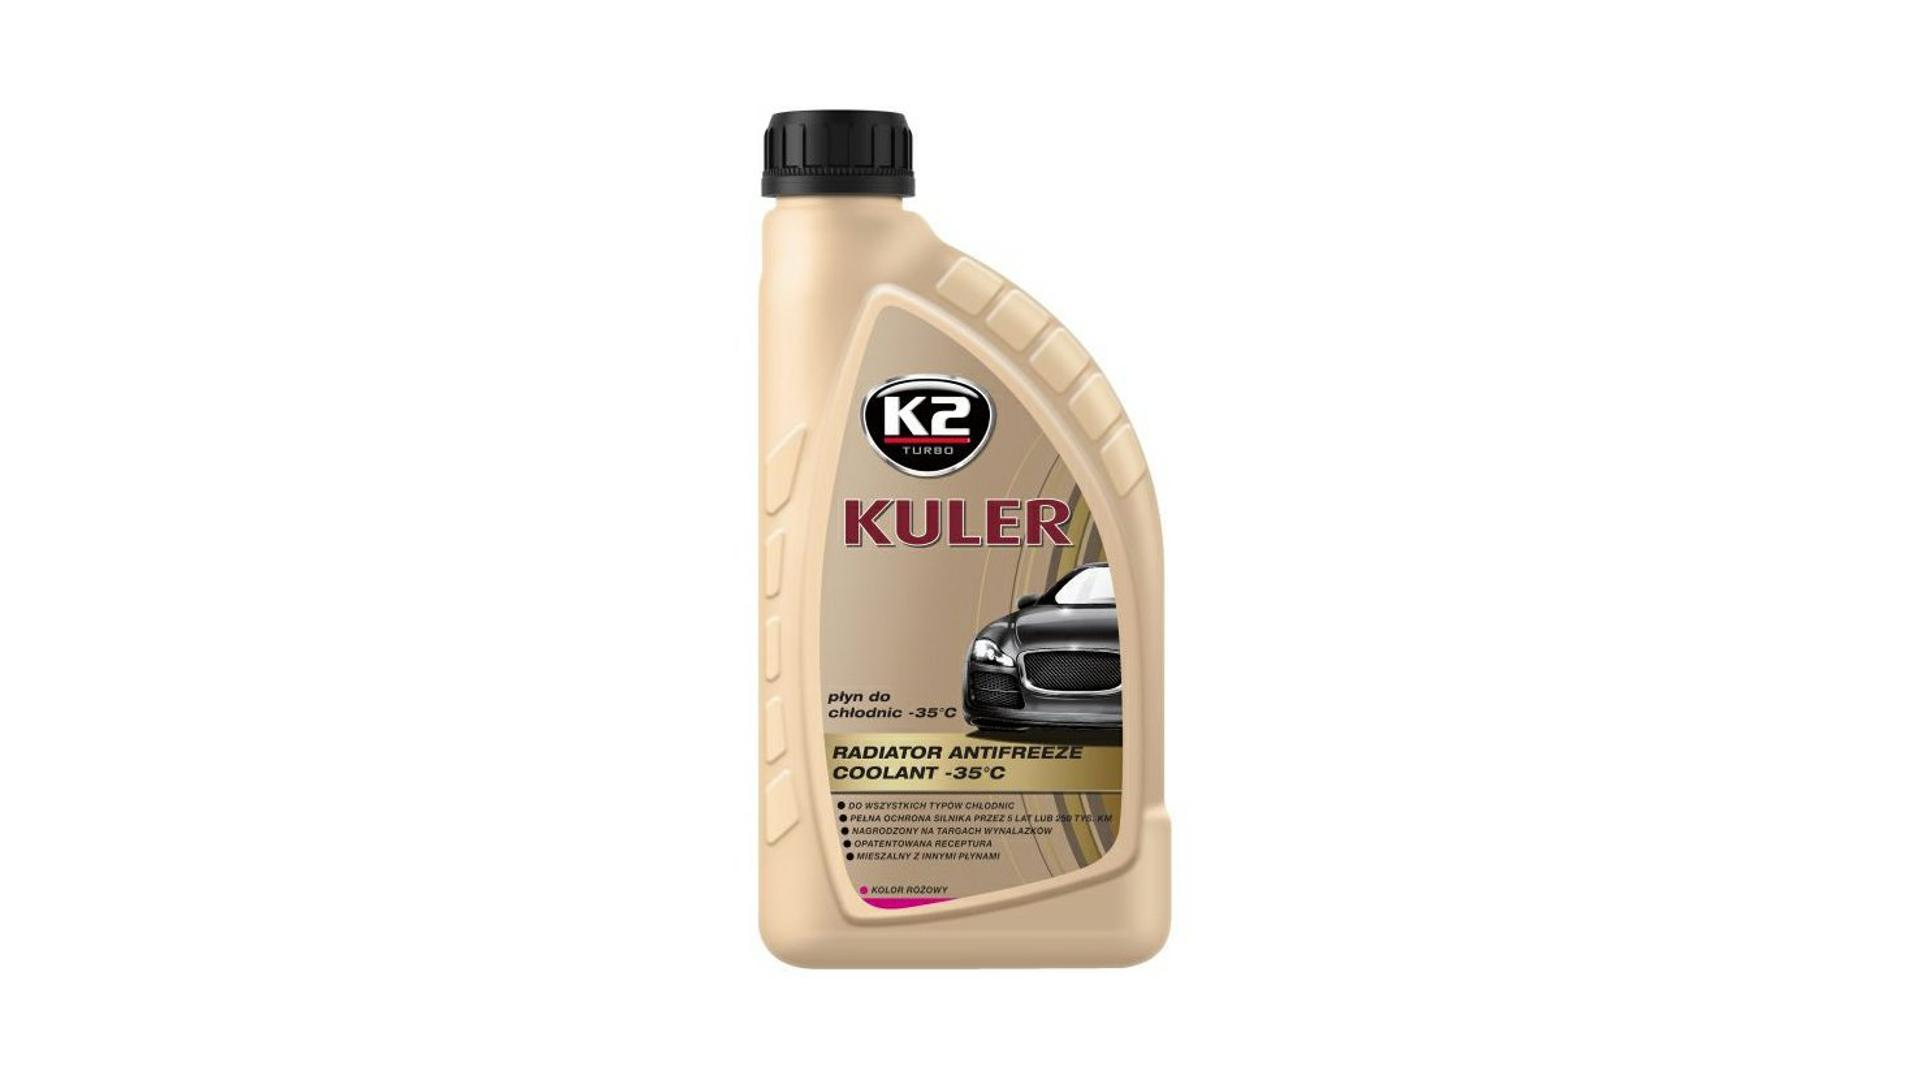 K2 Kuler G13 RUŽOVÁ 1 l - nemrznúca kvapalina do chladiča do -35 ° C